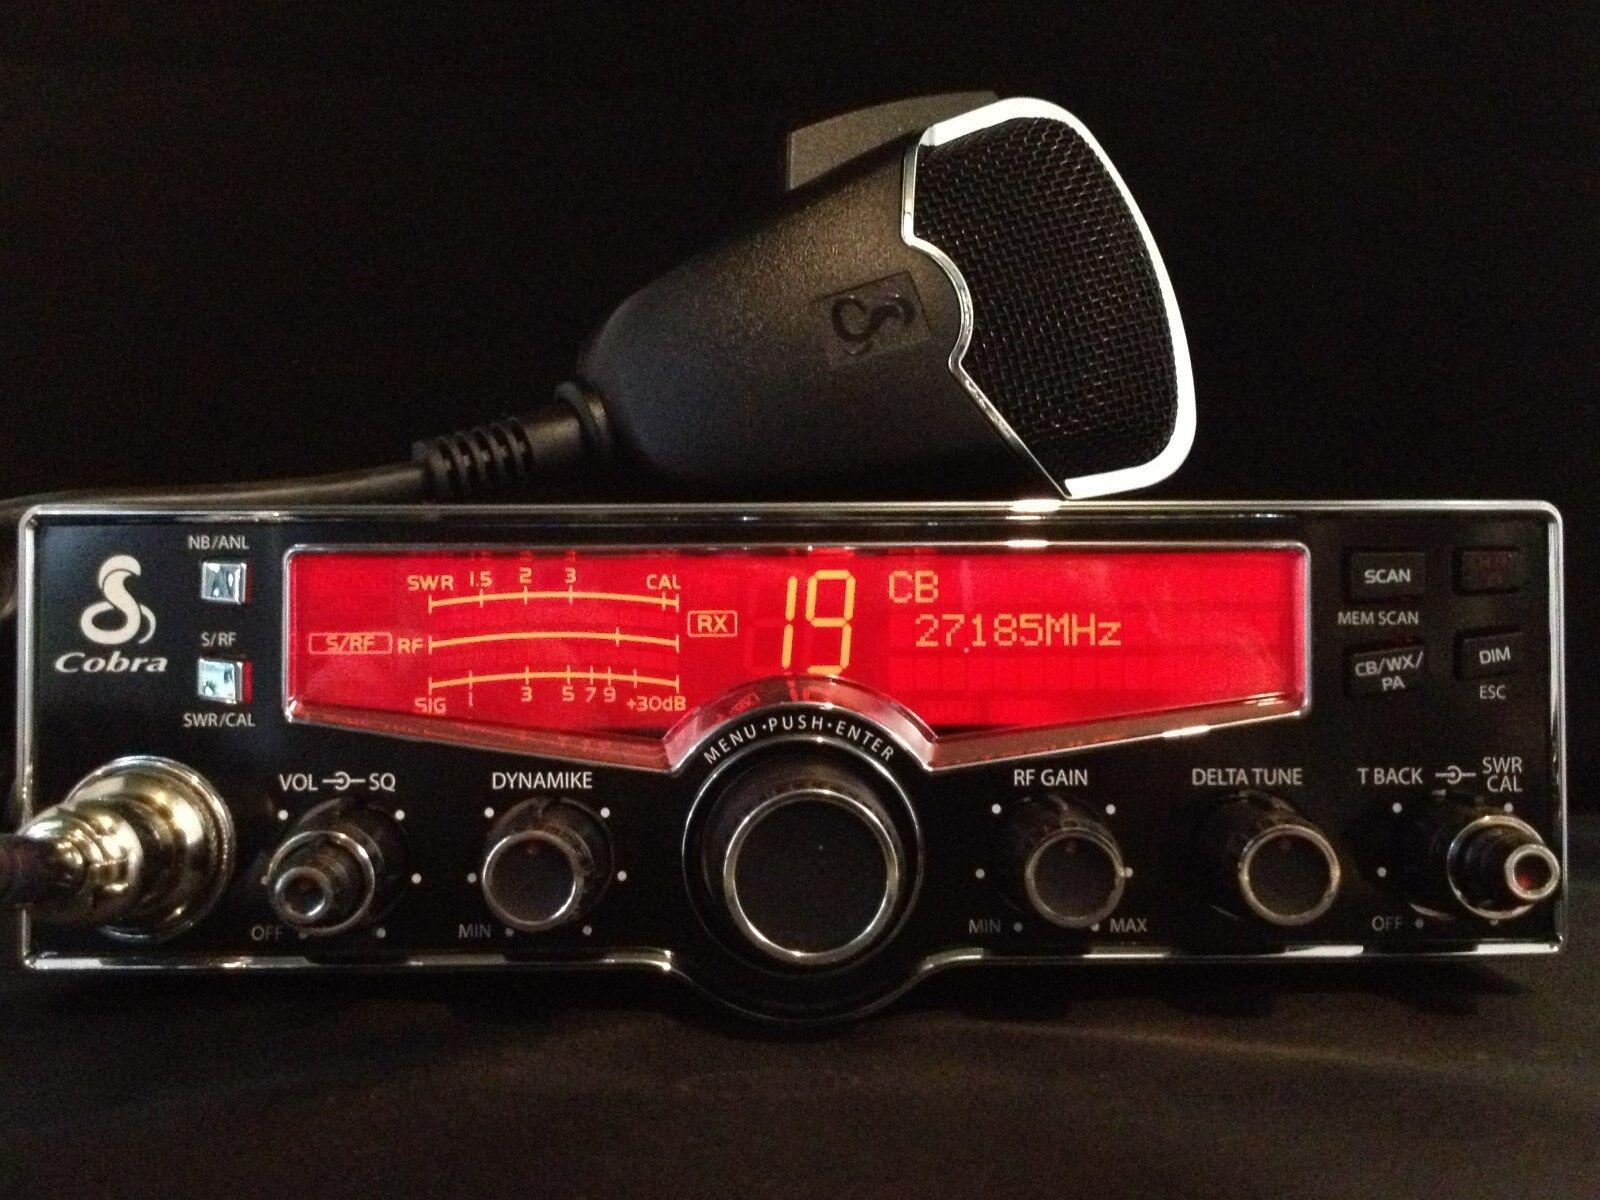 Cobra 29 LX CB Radio - PERFORMANCE TUNED + RECEIVE ENHANCED. Buy it now for 209.95